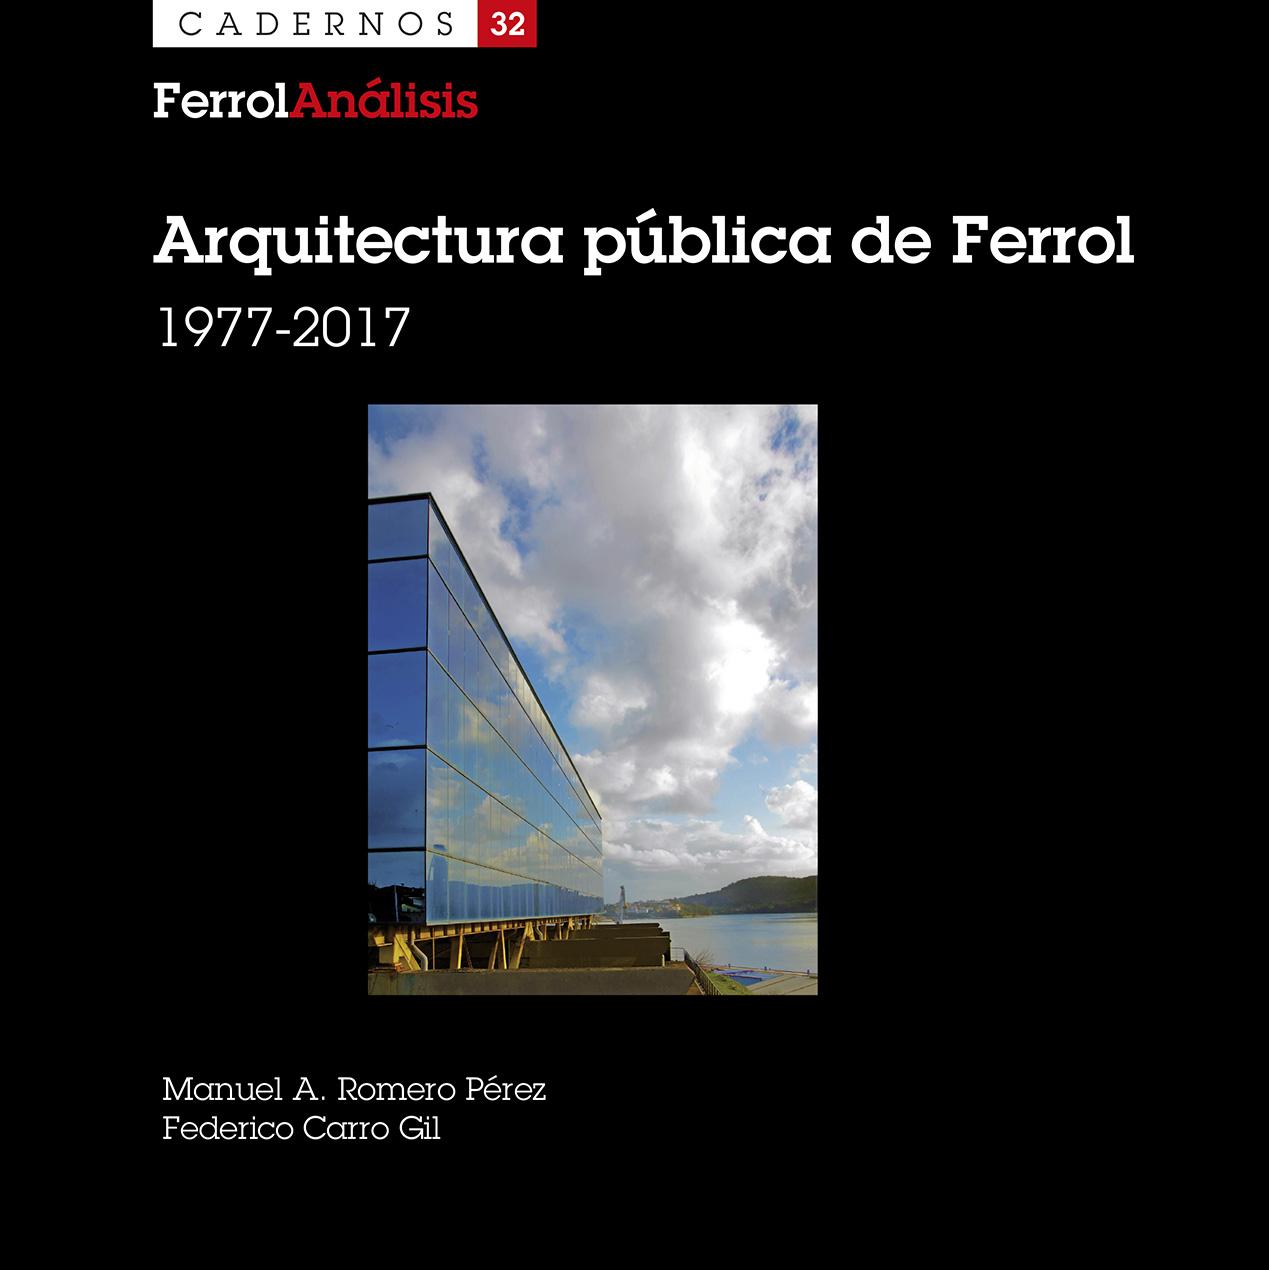 Caderno 32 FerrolAnálisis